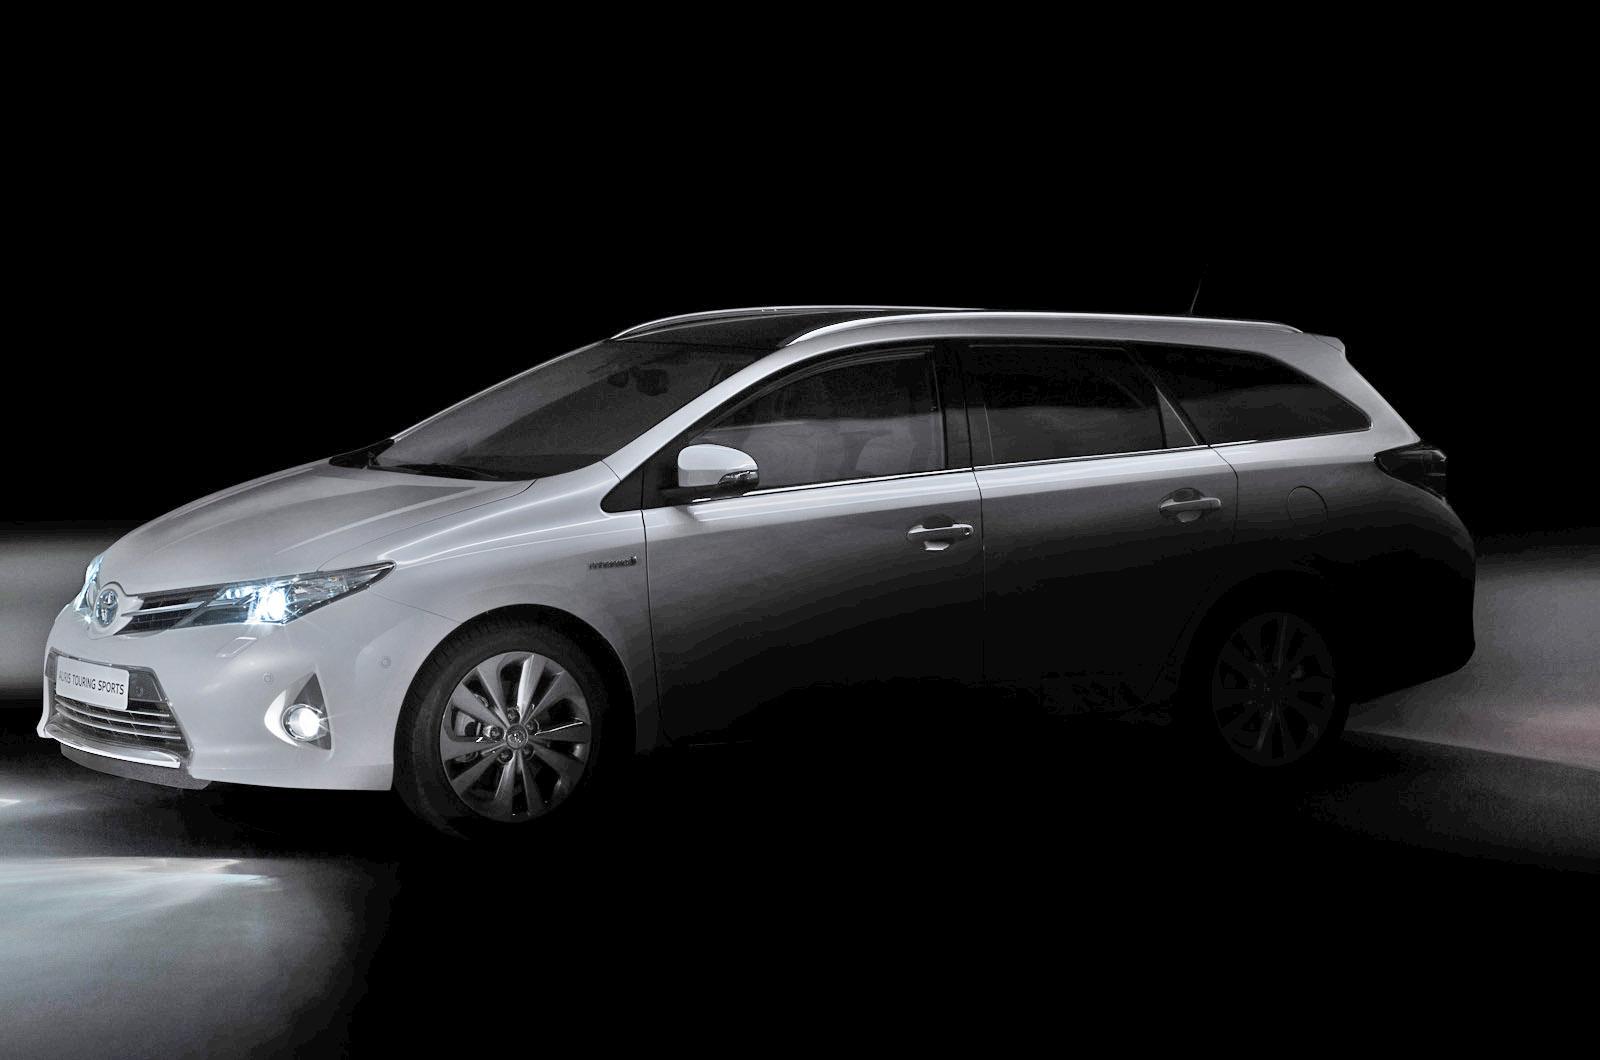 paris motor show 2012 toyota auris touring sports autocar. Black Bedroom Furniture Sets. Home Design Ideas